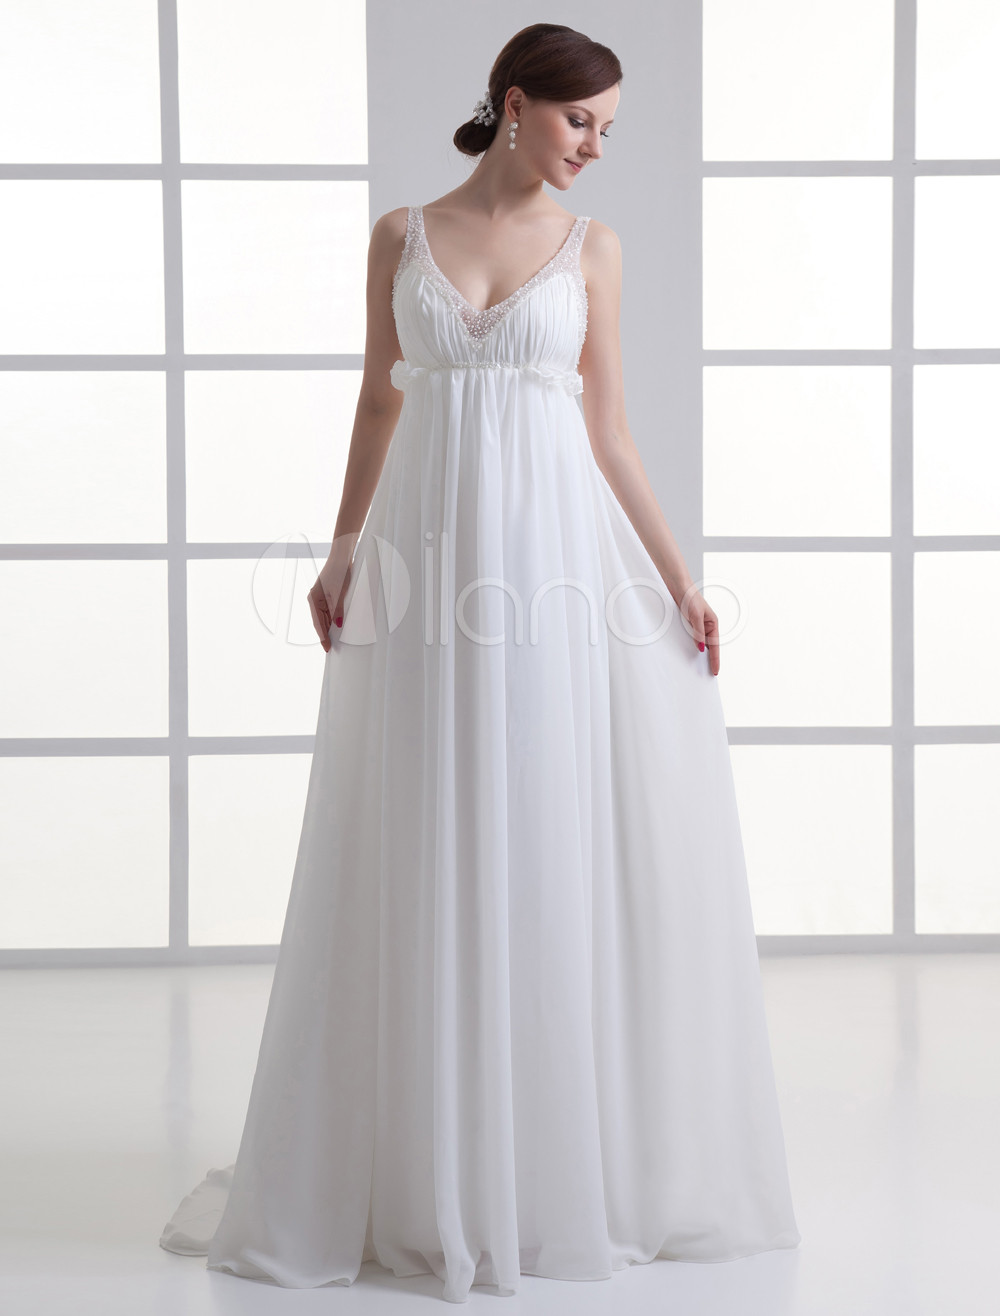 Ivory A-line Spaghetti Strap Beading Chiffon Bridal Wedding Gown